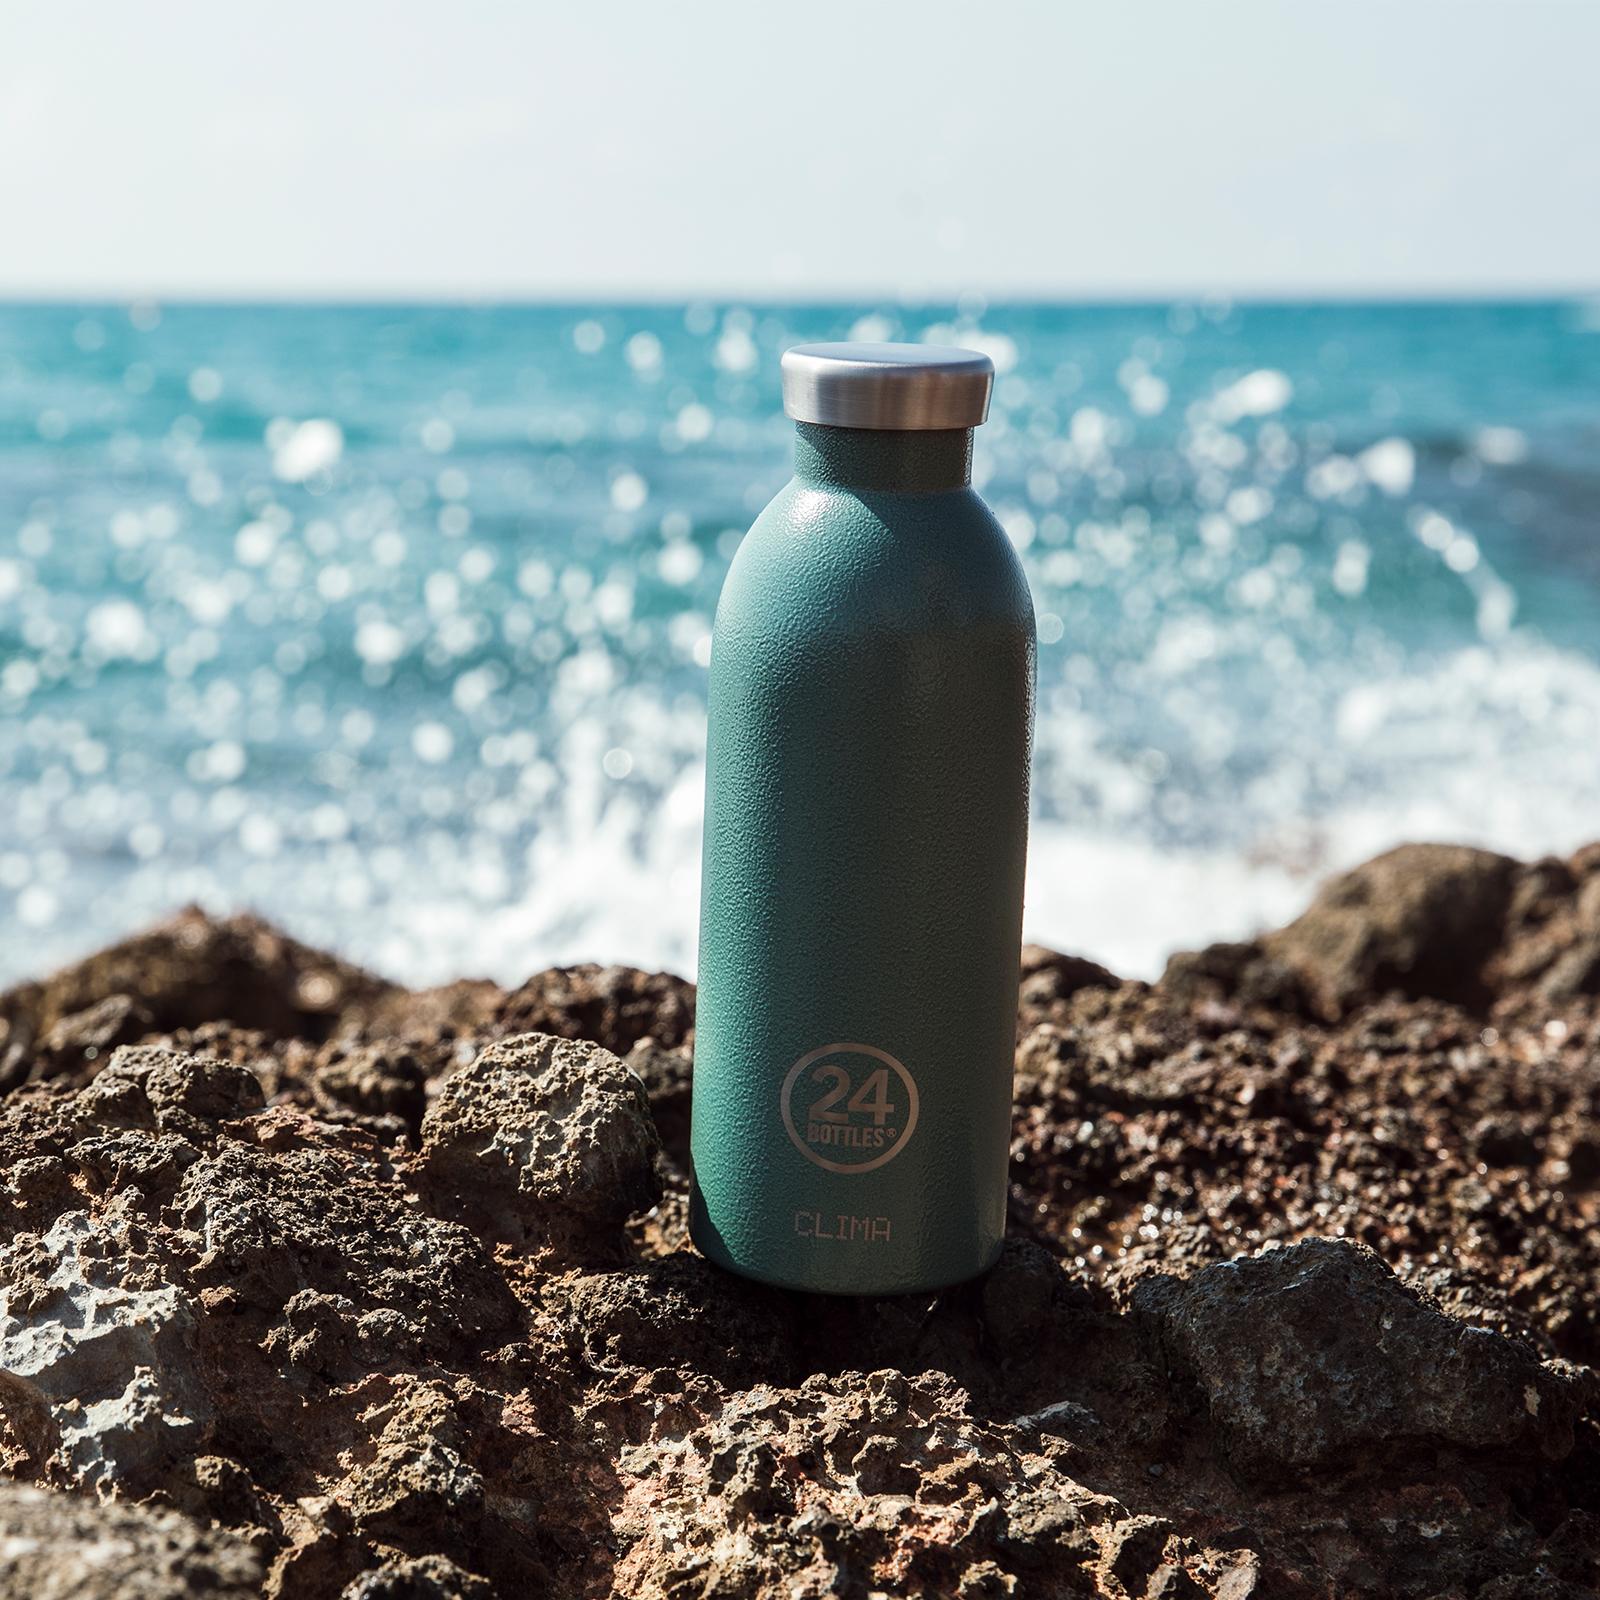 24Bottles Clima 500 ml Trinkflasche, Farbe: moosgrün